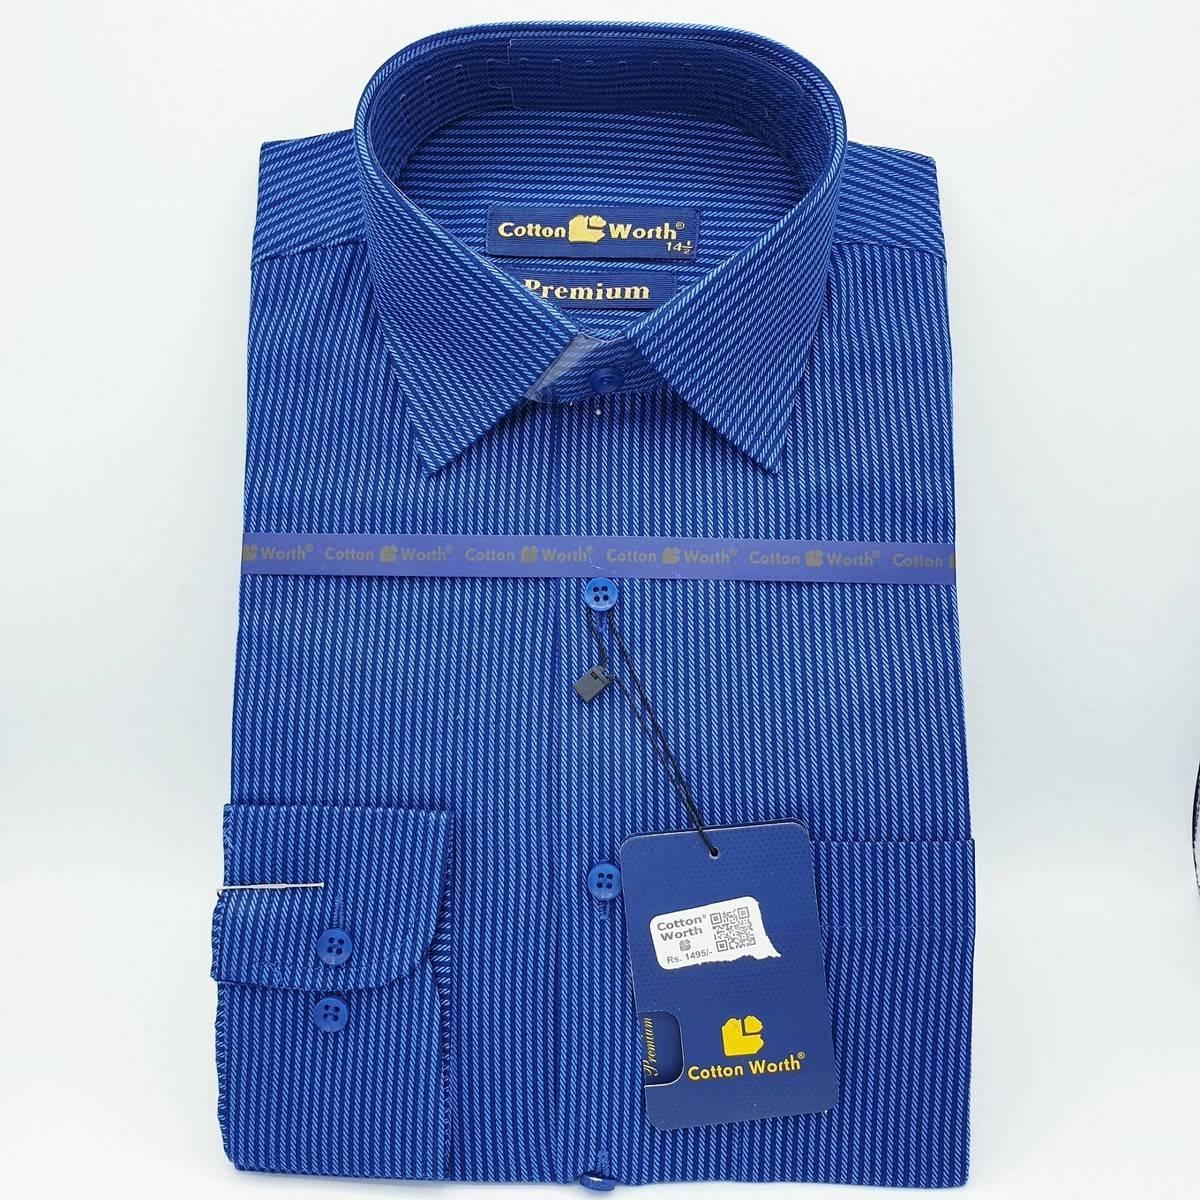 Bright Blue Lining High Quality Cotton Dress Shirt For Men